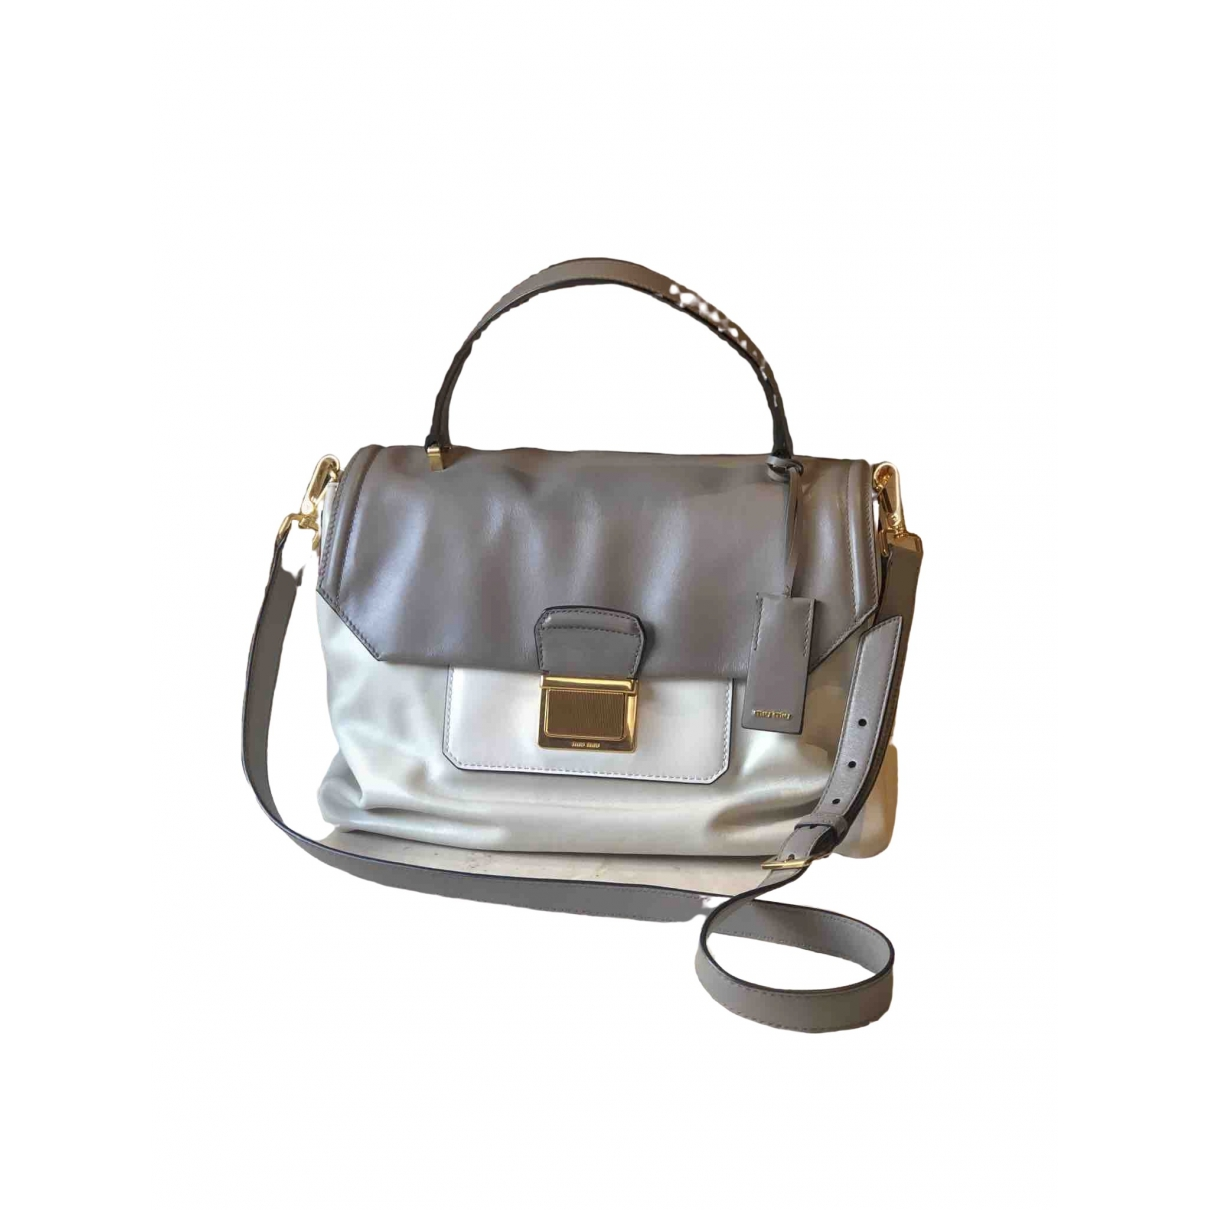 Miu Miu Bow bag White Leather handbag for Women \N